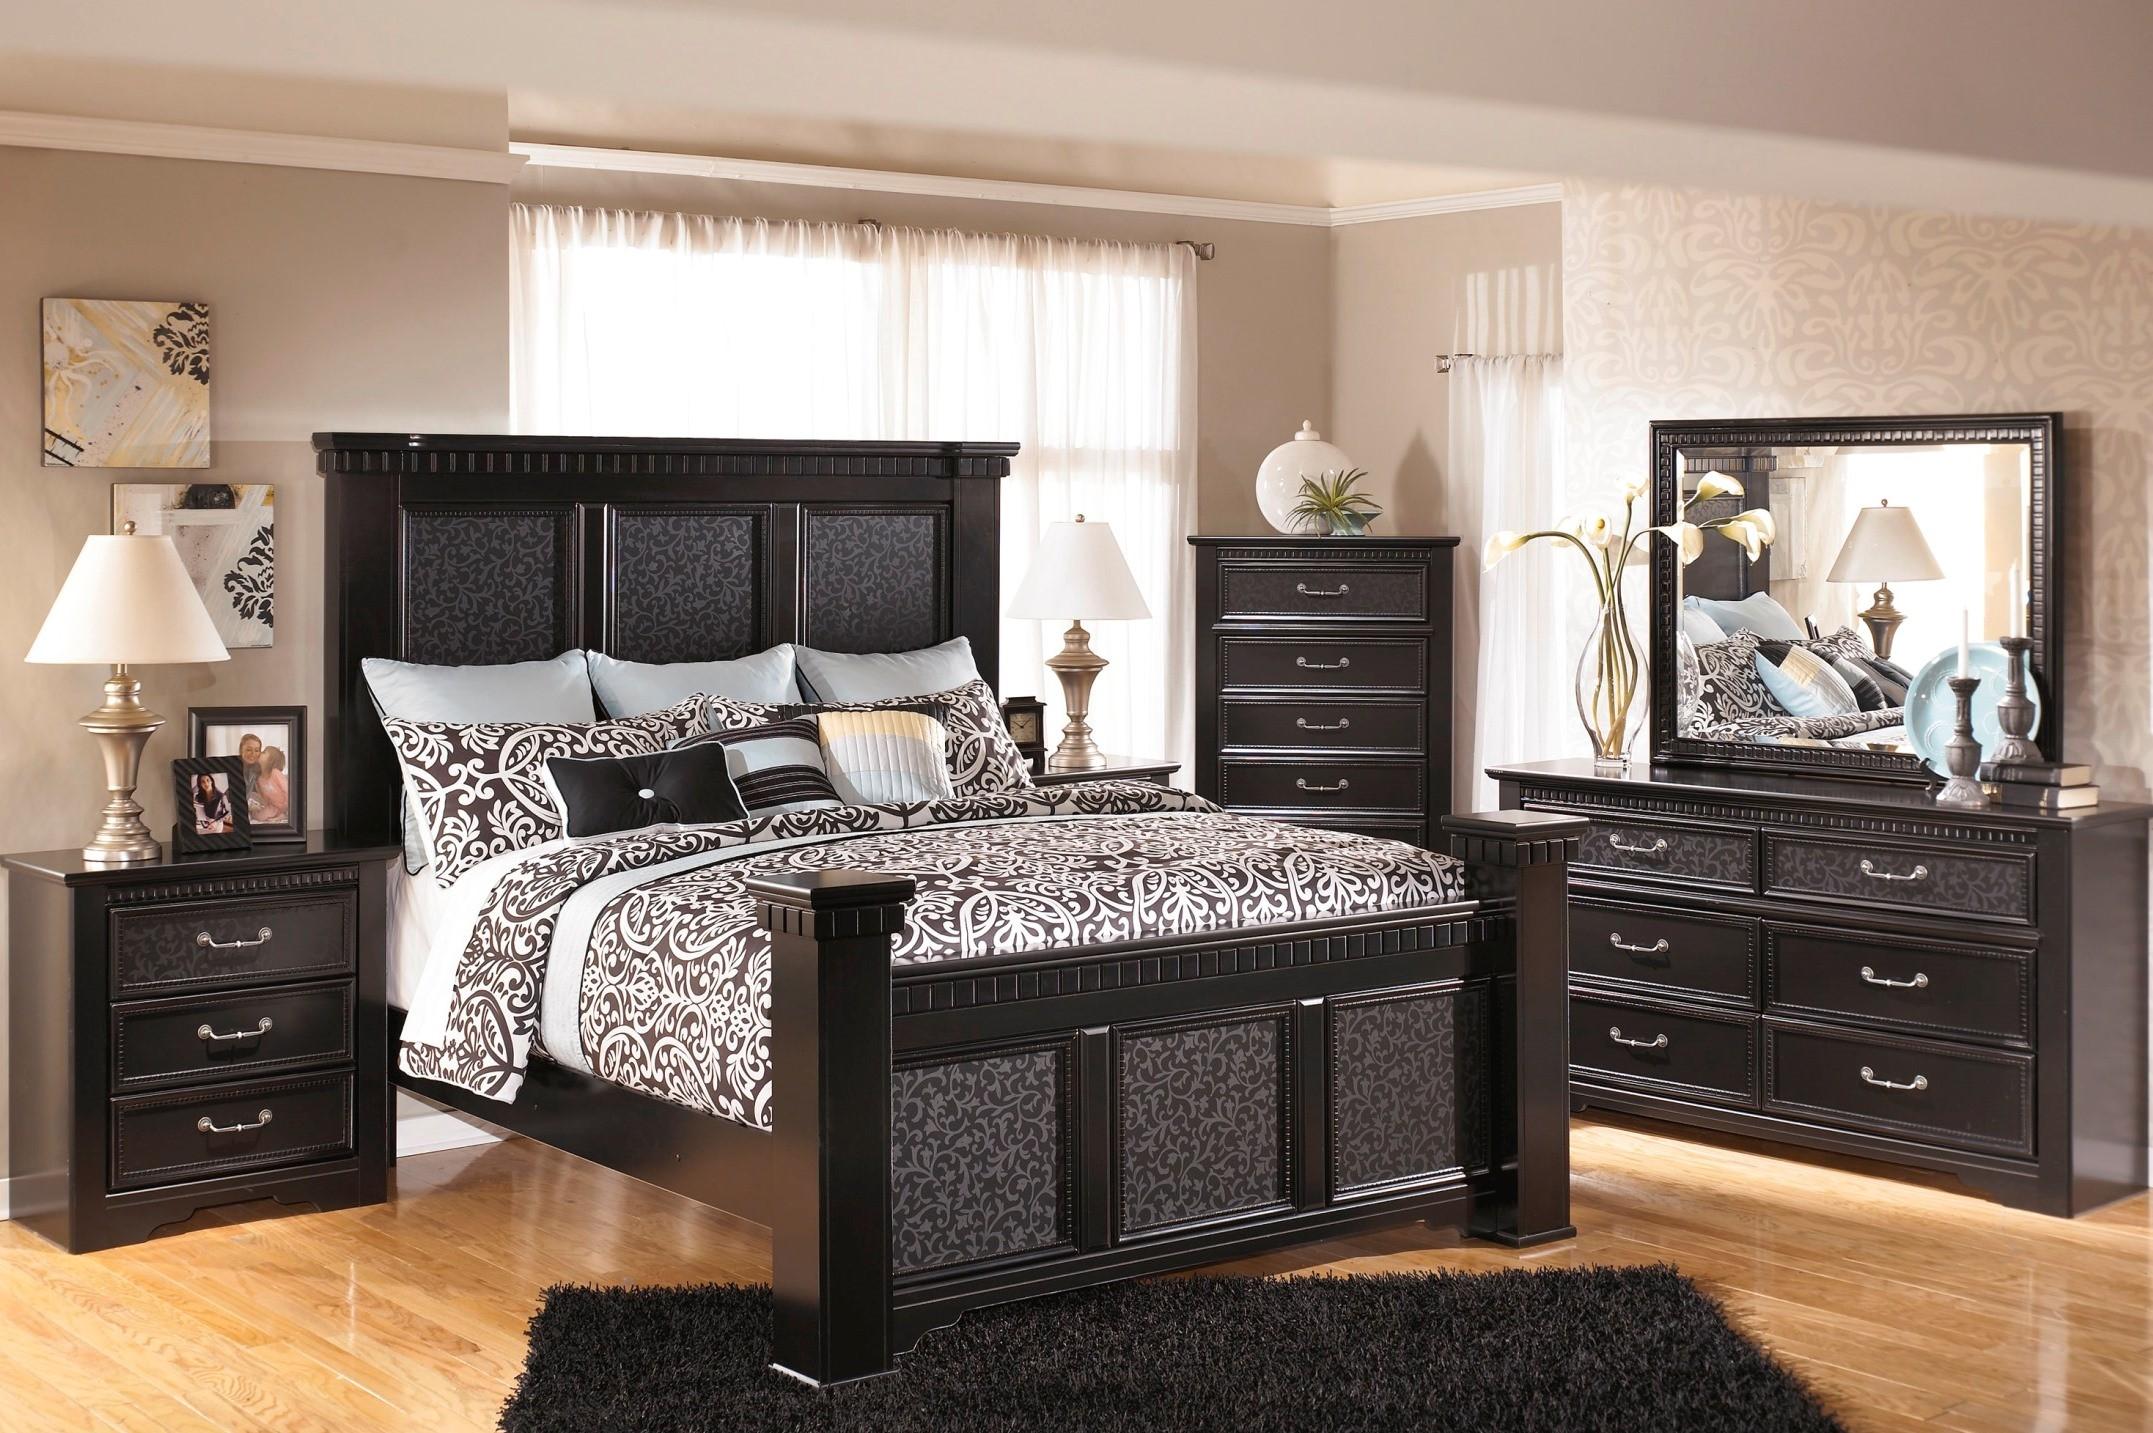 Cavallino Mansion Bedroom Set From Ashley B291 Coleman